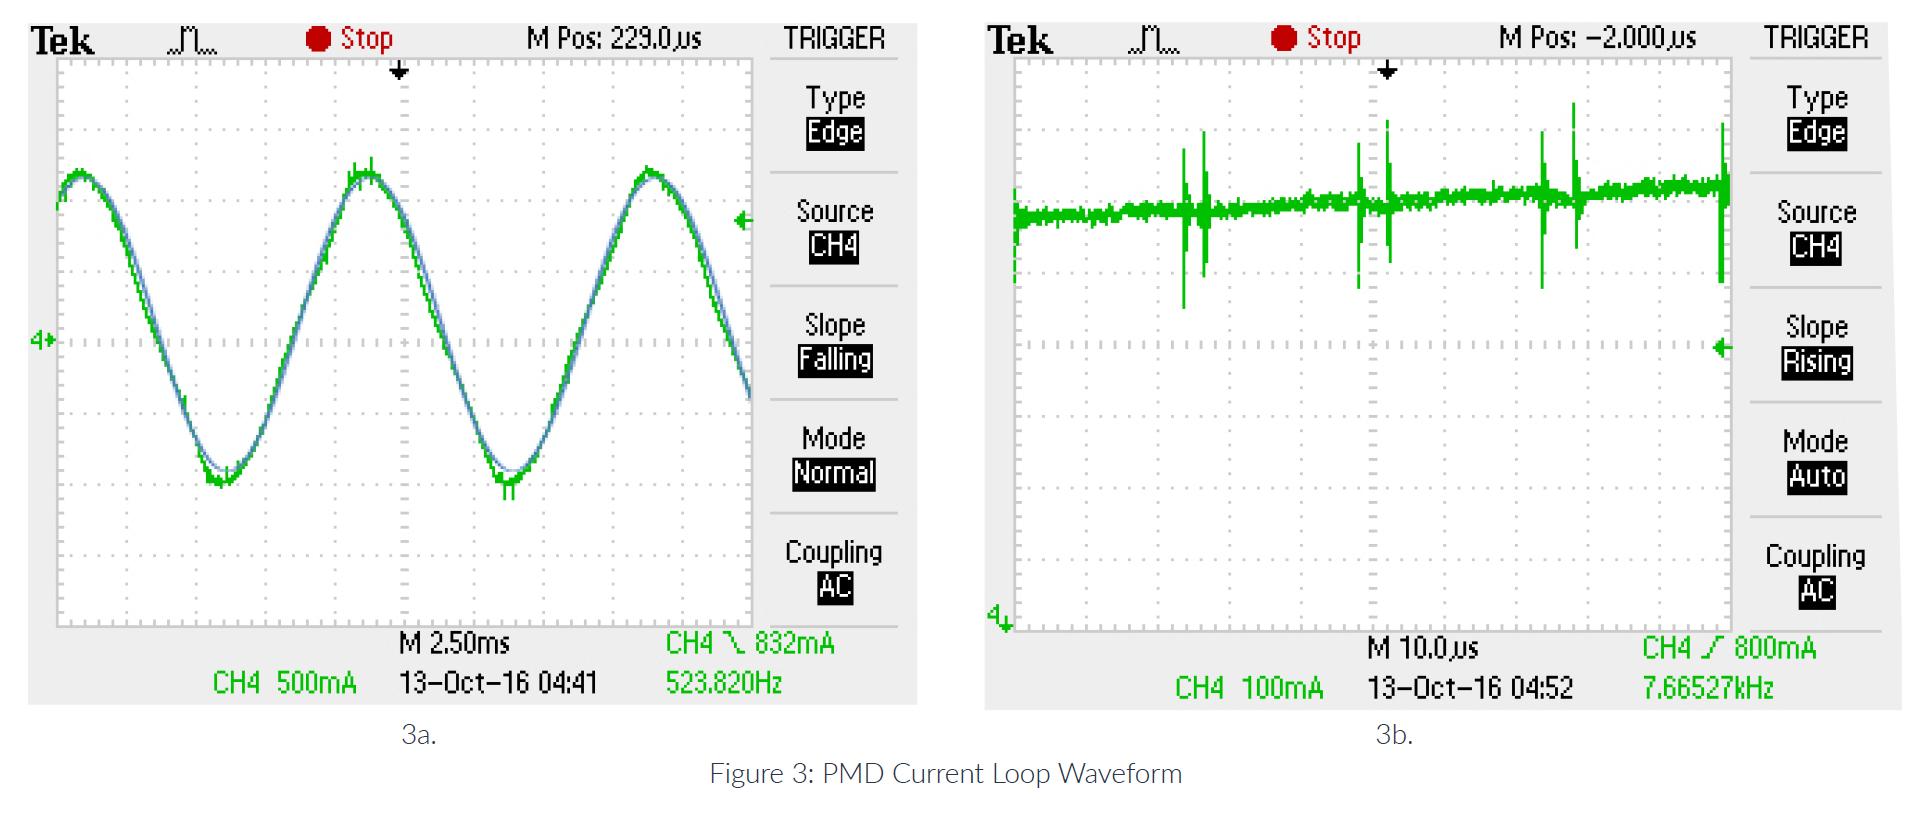 Reduce Step Motor Noise Using PMD Digital Current Loop